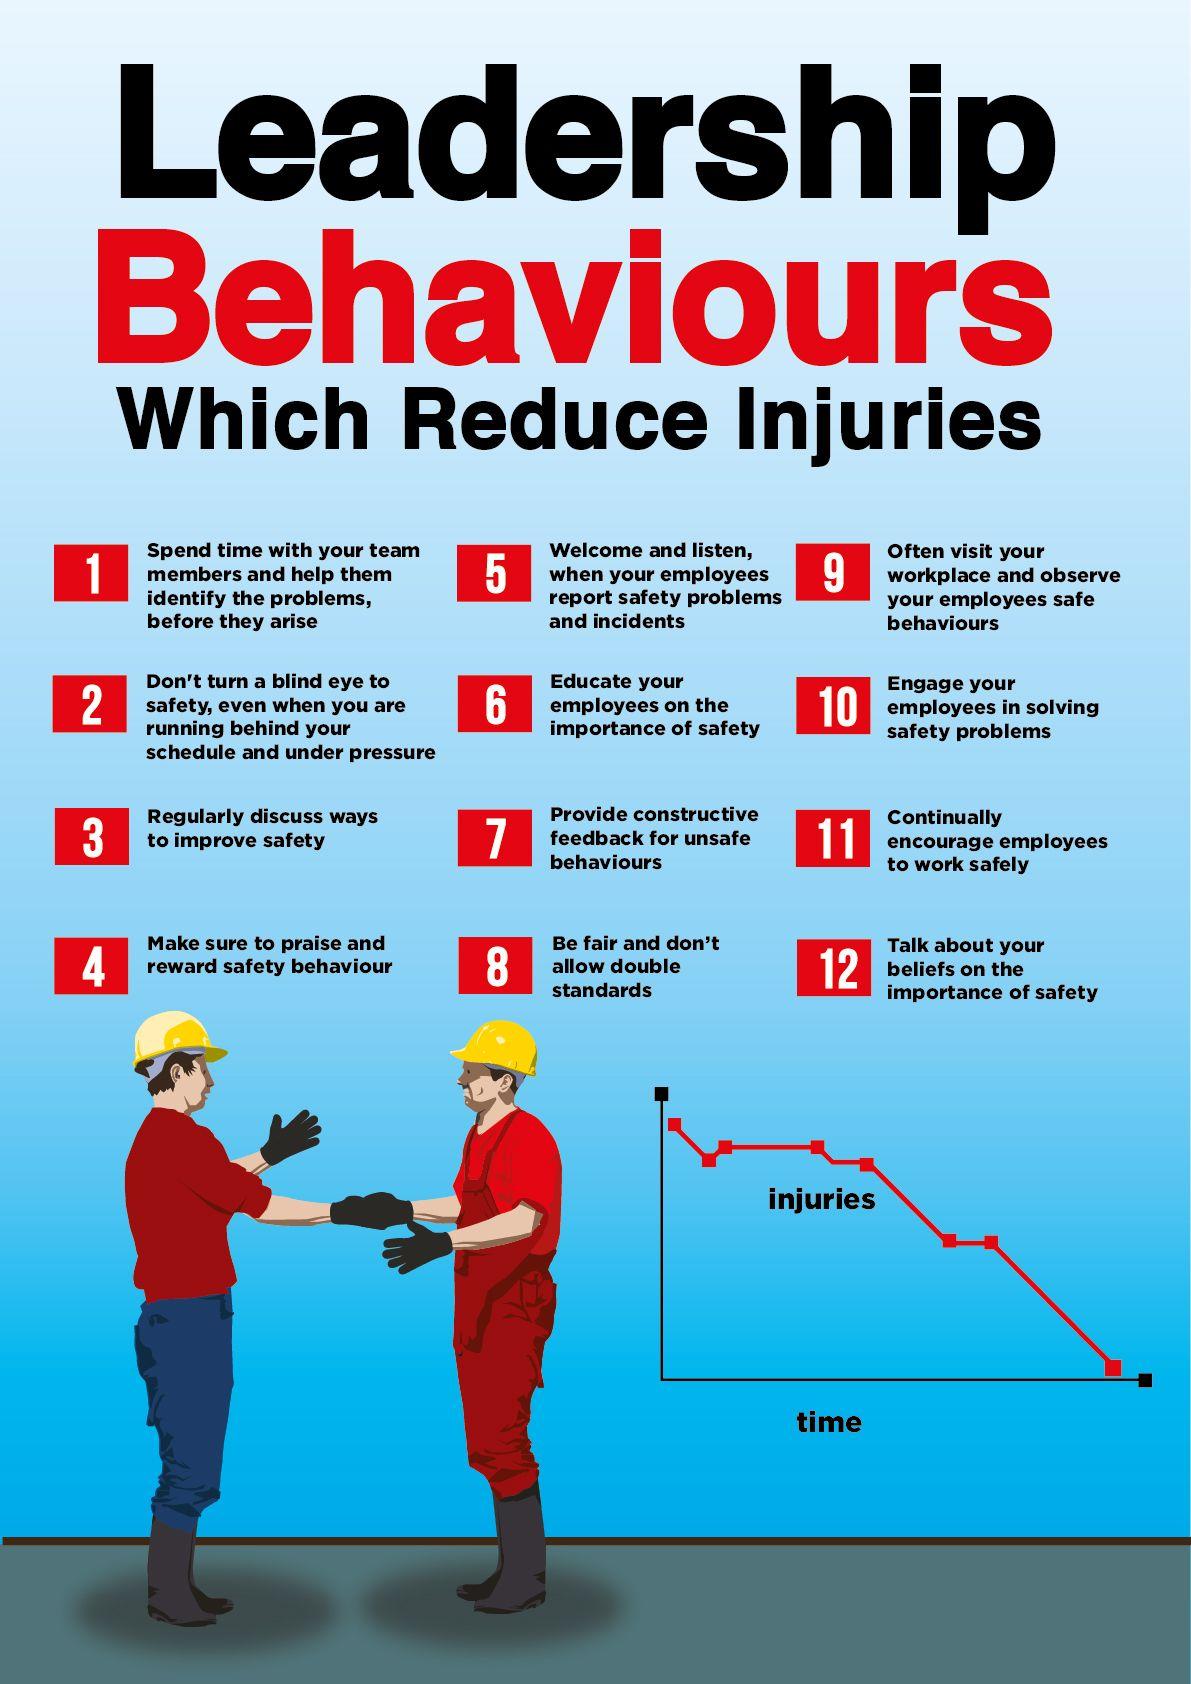 Leadership Behaviors That Reduce Workplace Injuries